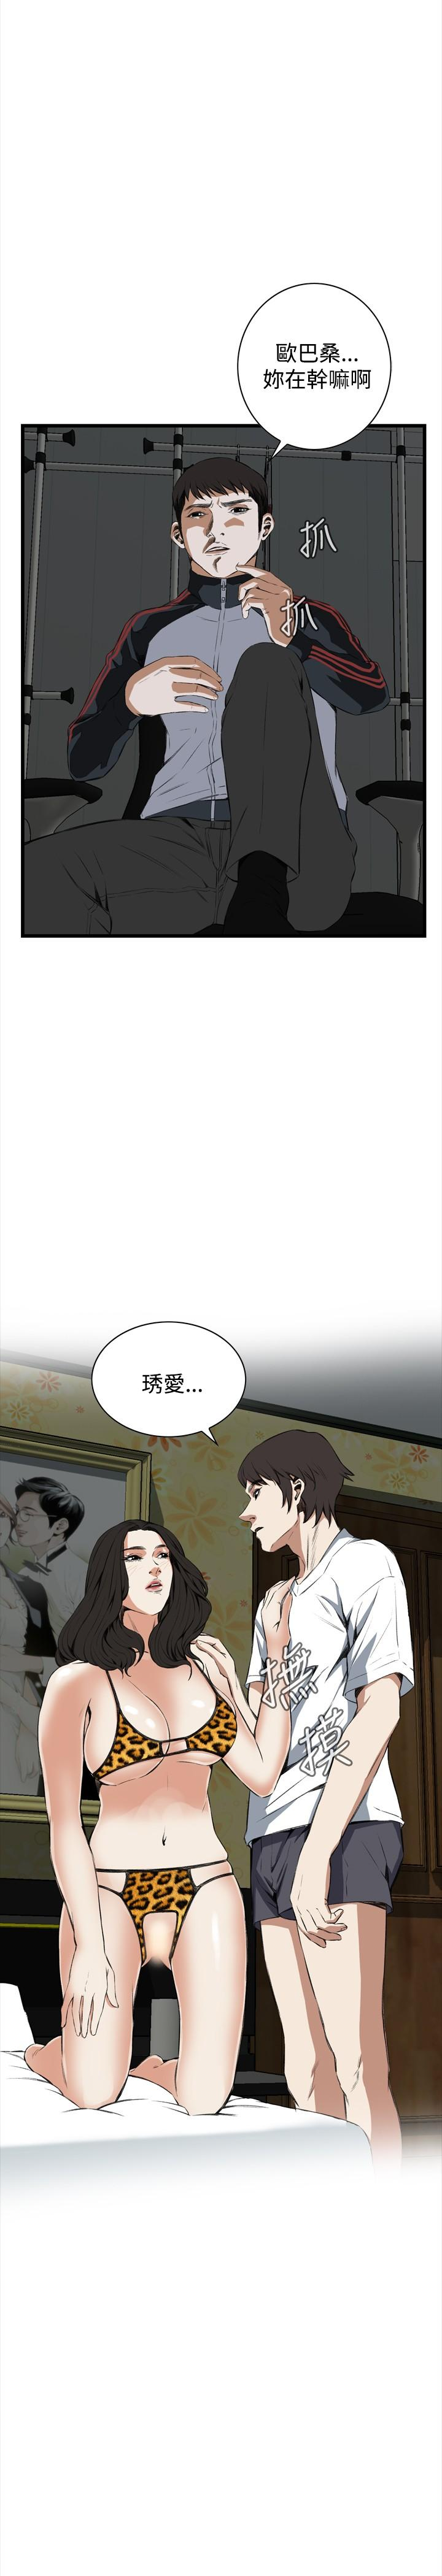 Take a Peek 偷窥 Ch.39~55 [Chinese]中文 432